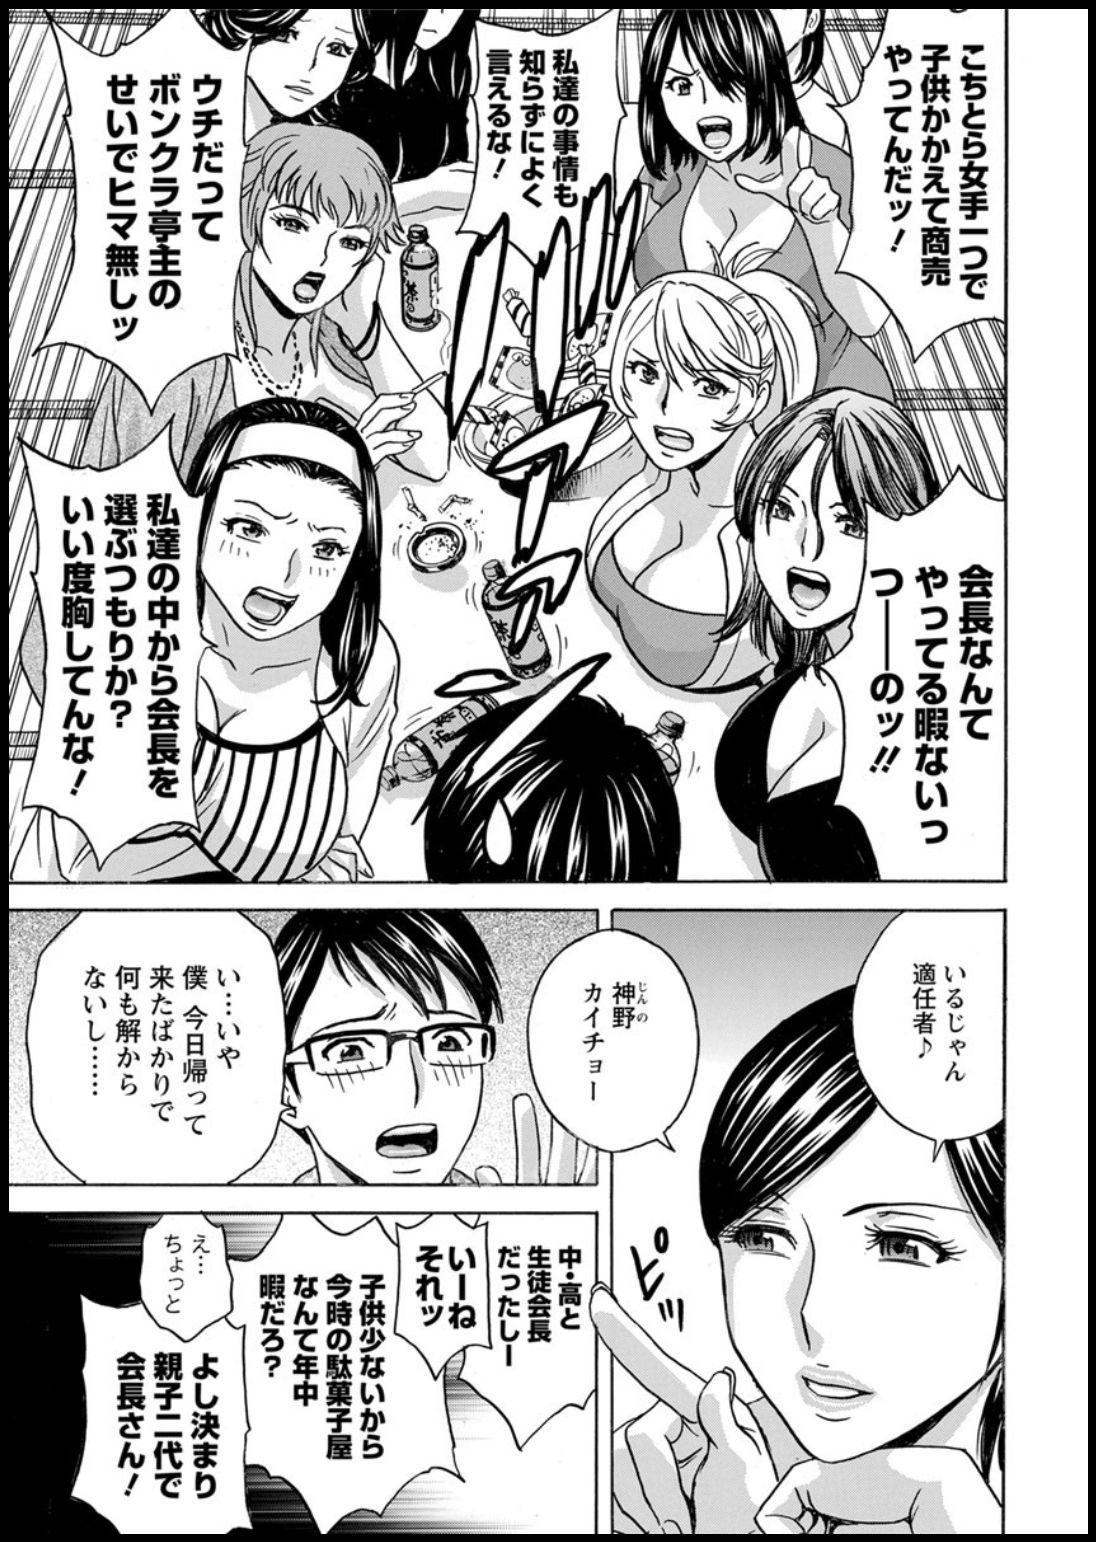 [Hidemaru] Yurase Bikyonyuu! Hataraku J-Cup Ch. 1-5 [Digital] 8